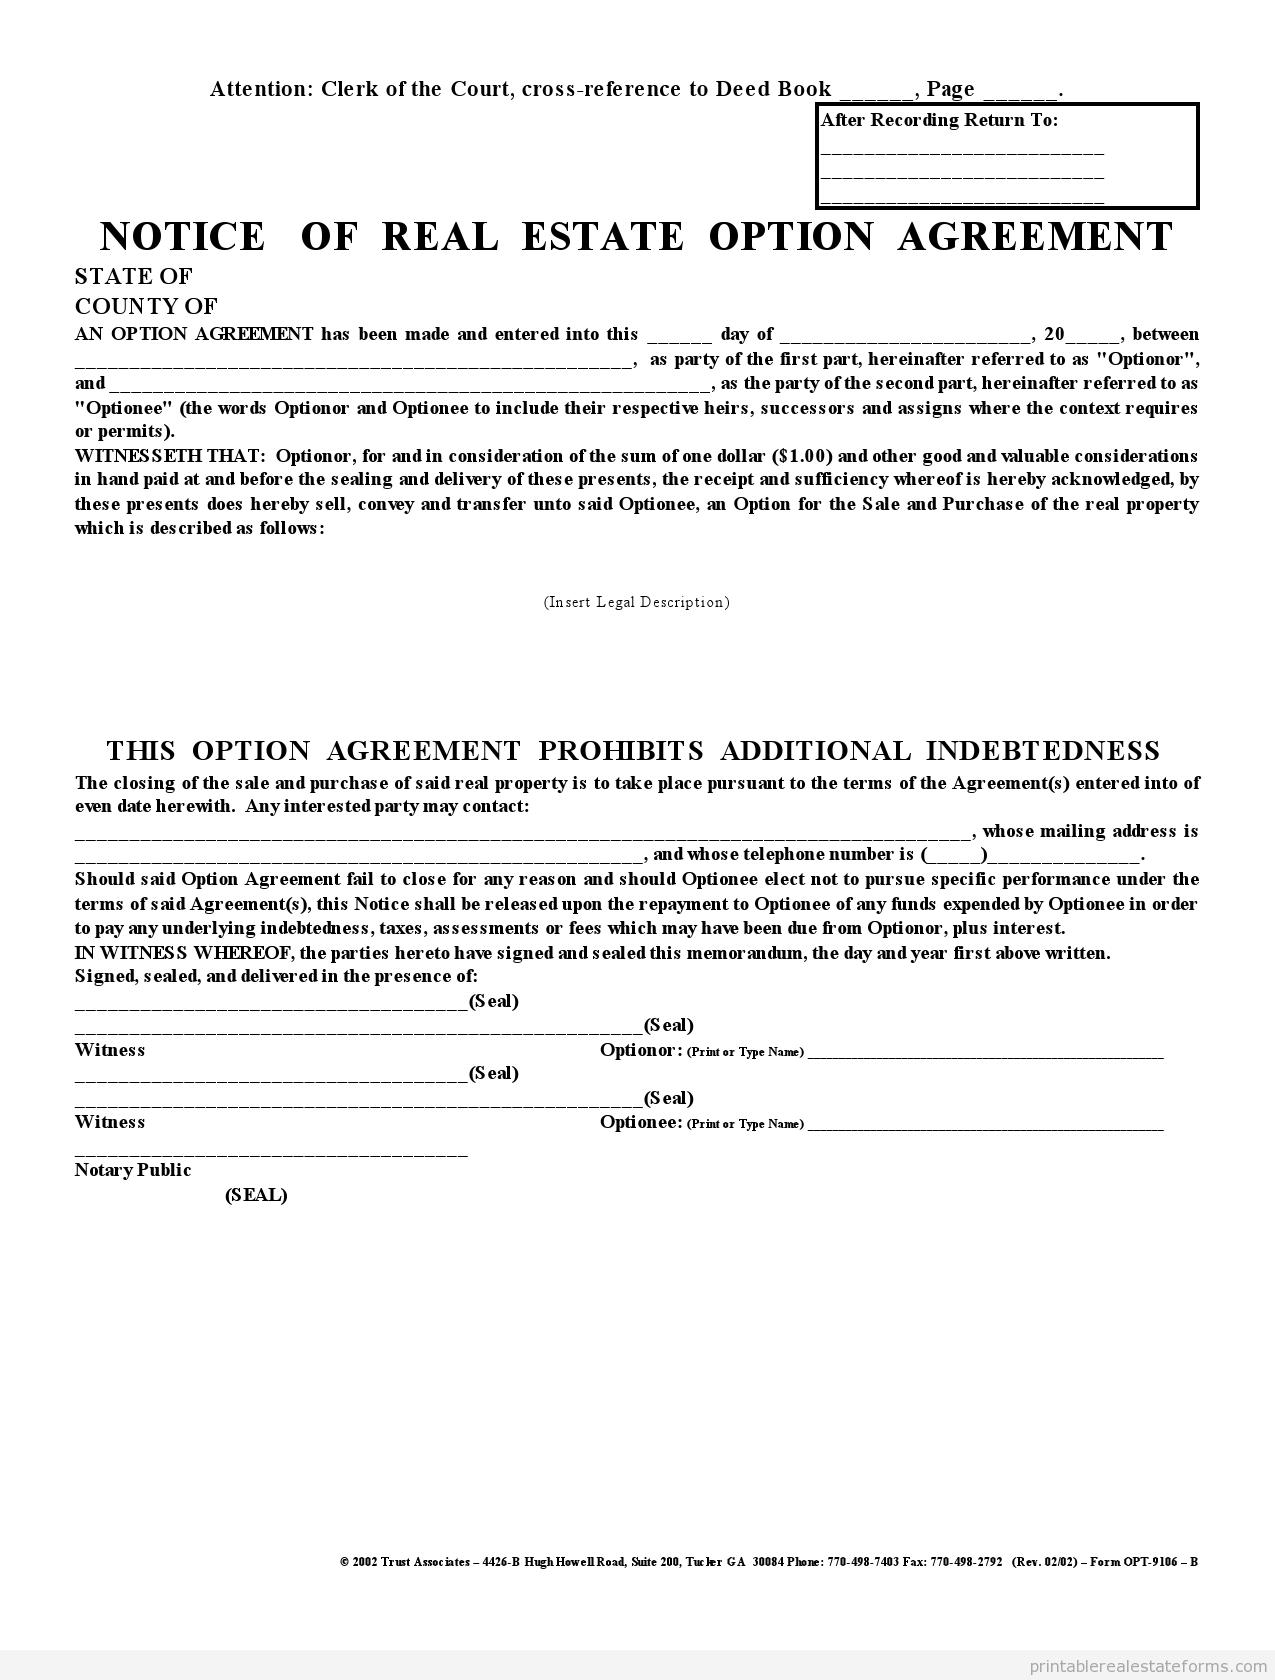 Affadavit & Memorandum Of Option 1 Party Agreement PDF